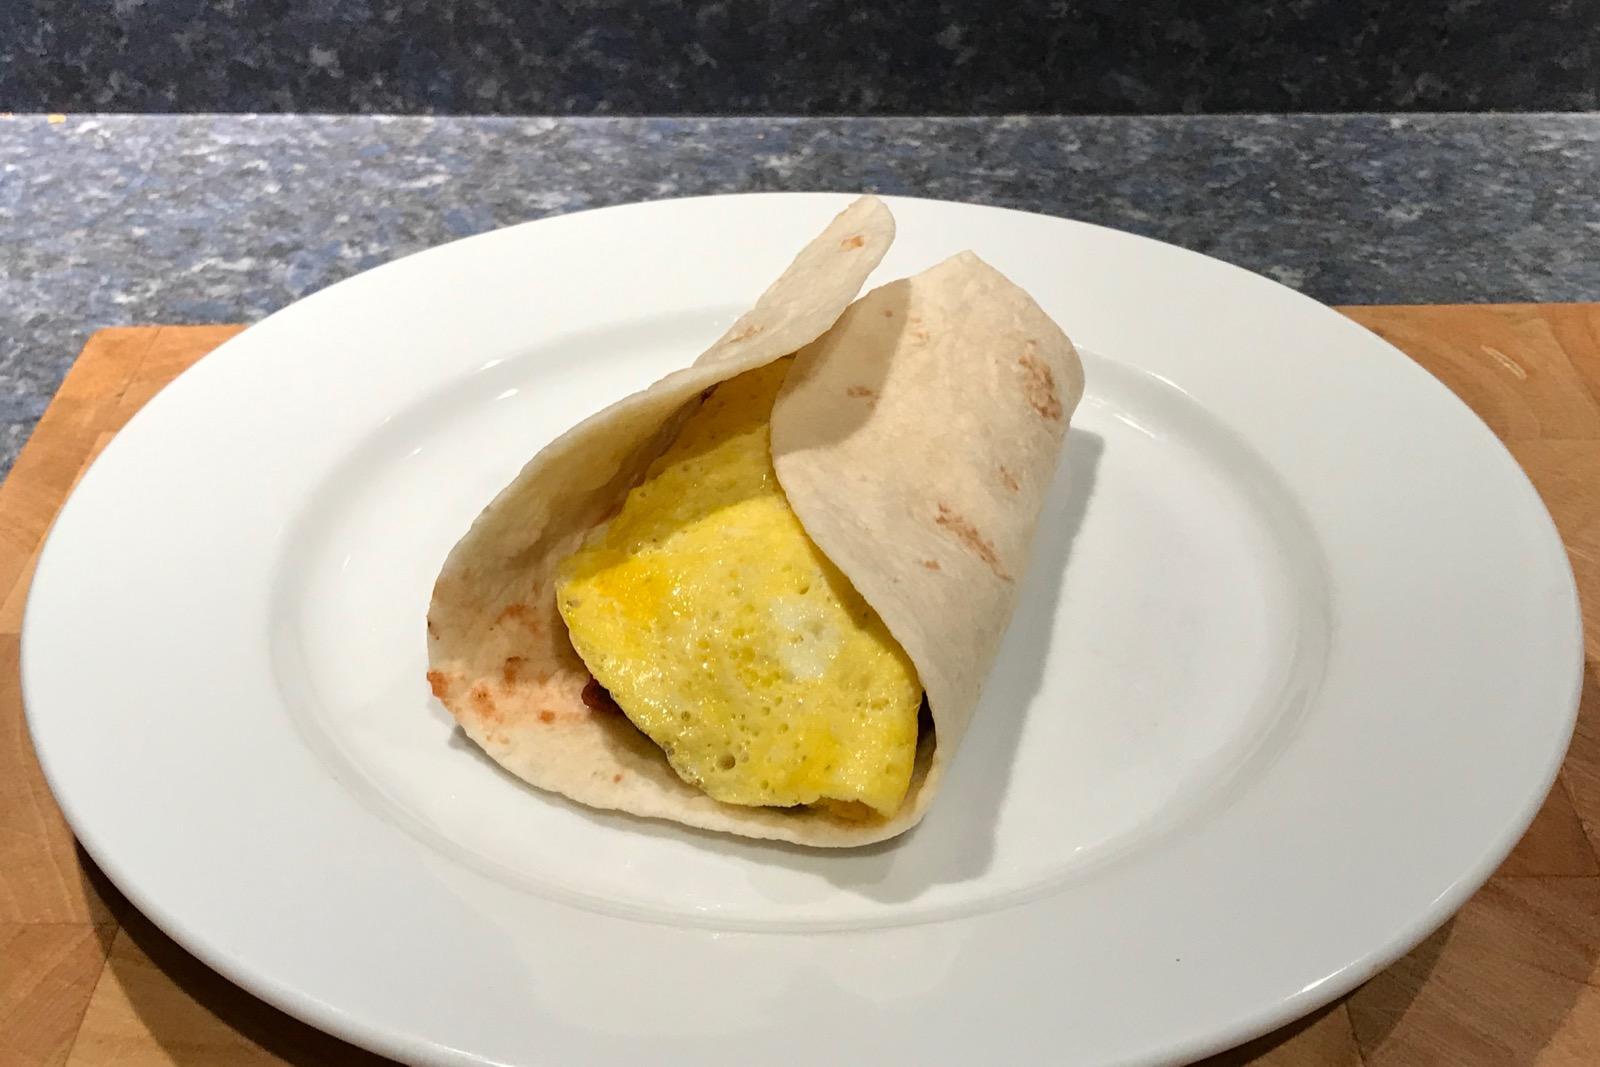 http://blog.rickk.com/food/2018/12/01/ate.2018.12.01.b.jpg